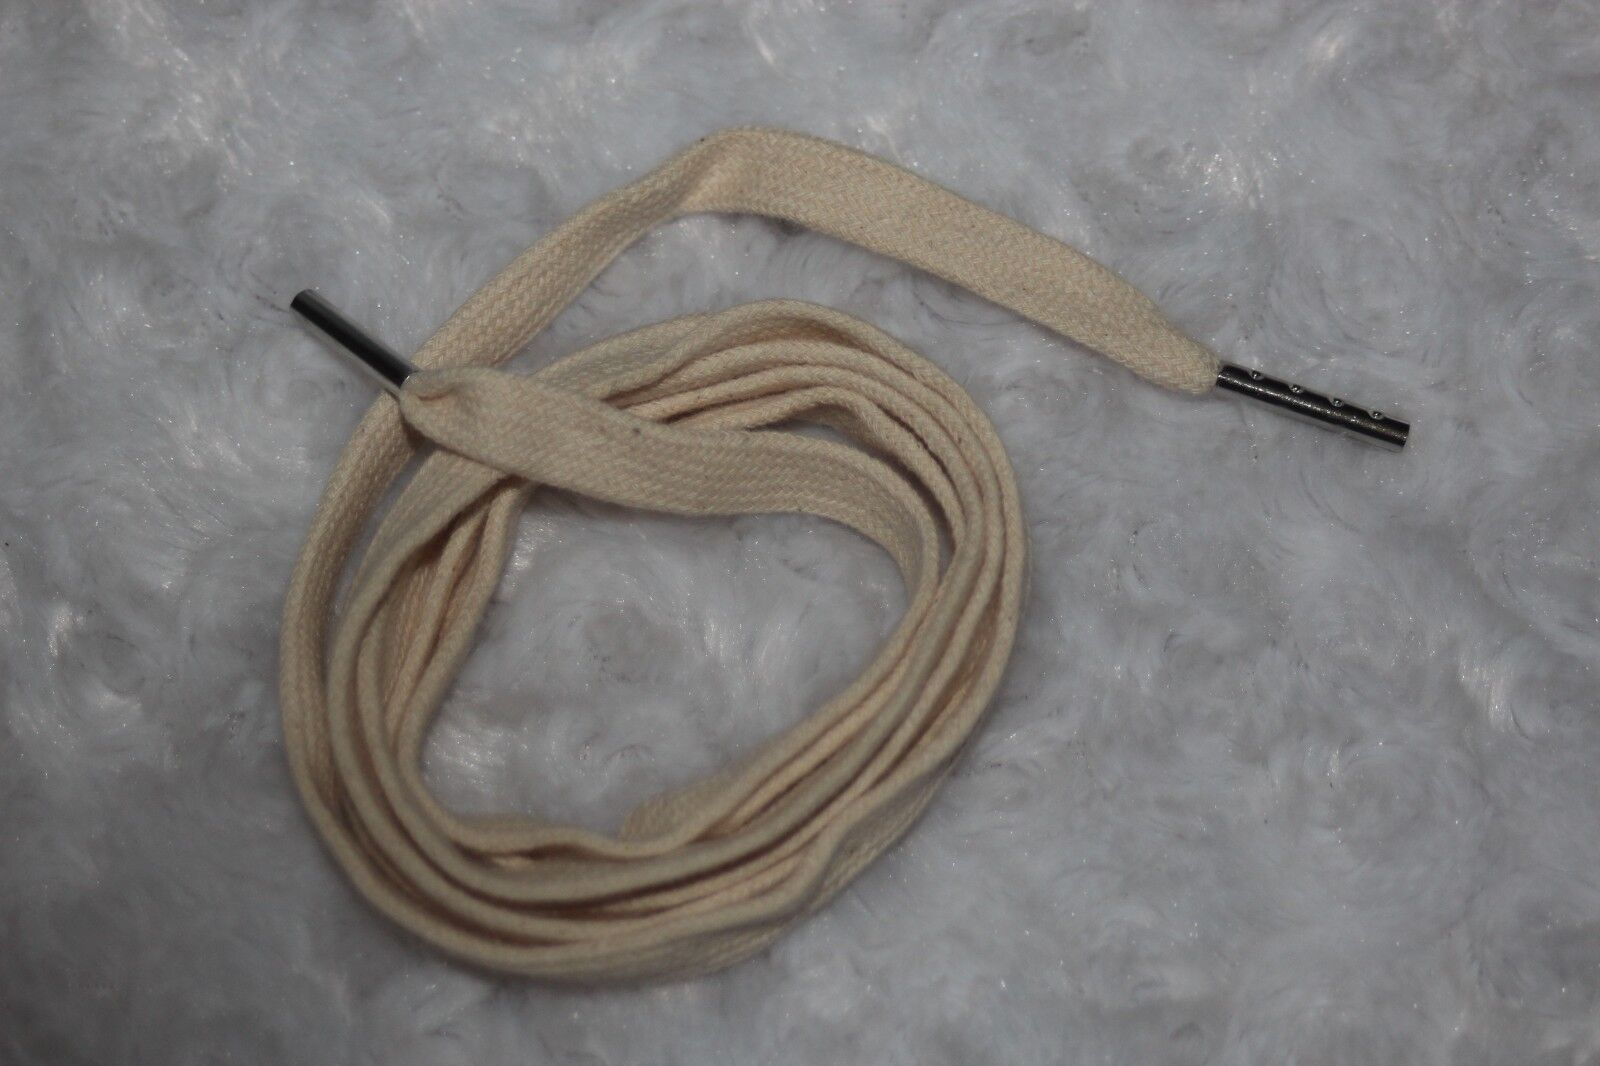 Replacement Drawstring White Red Black Gray plastic Tip Hoodies Sweatpants Bags Cream Metal Tip FLAT 50